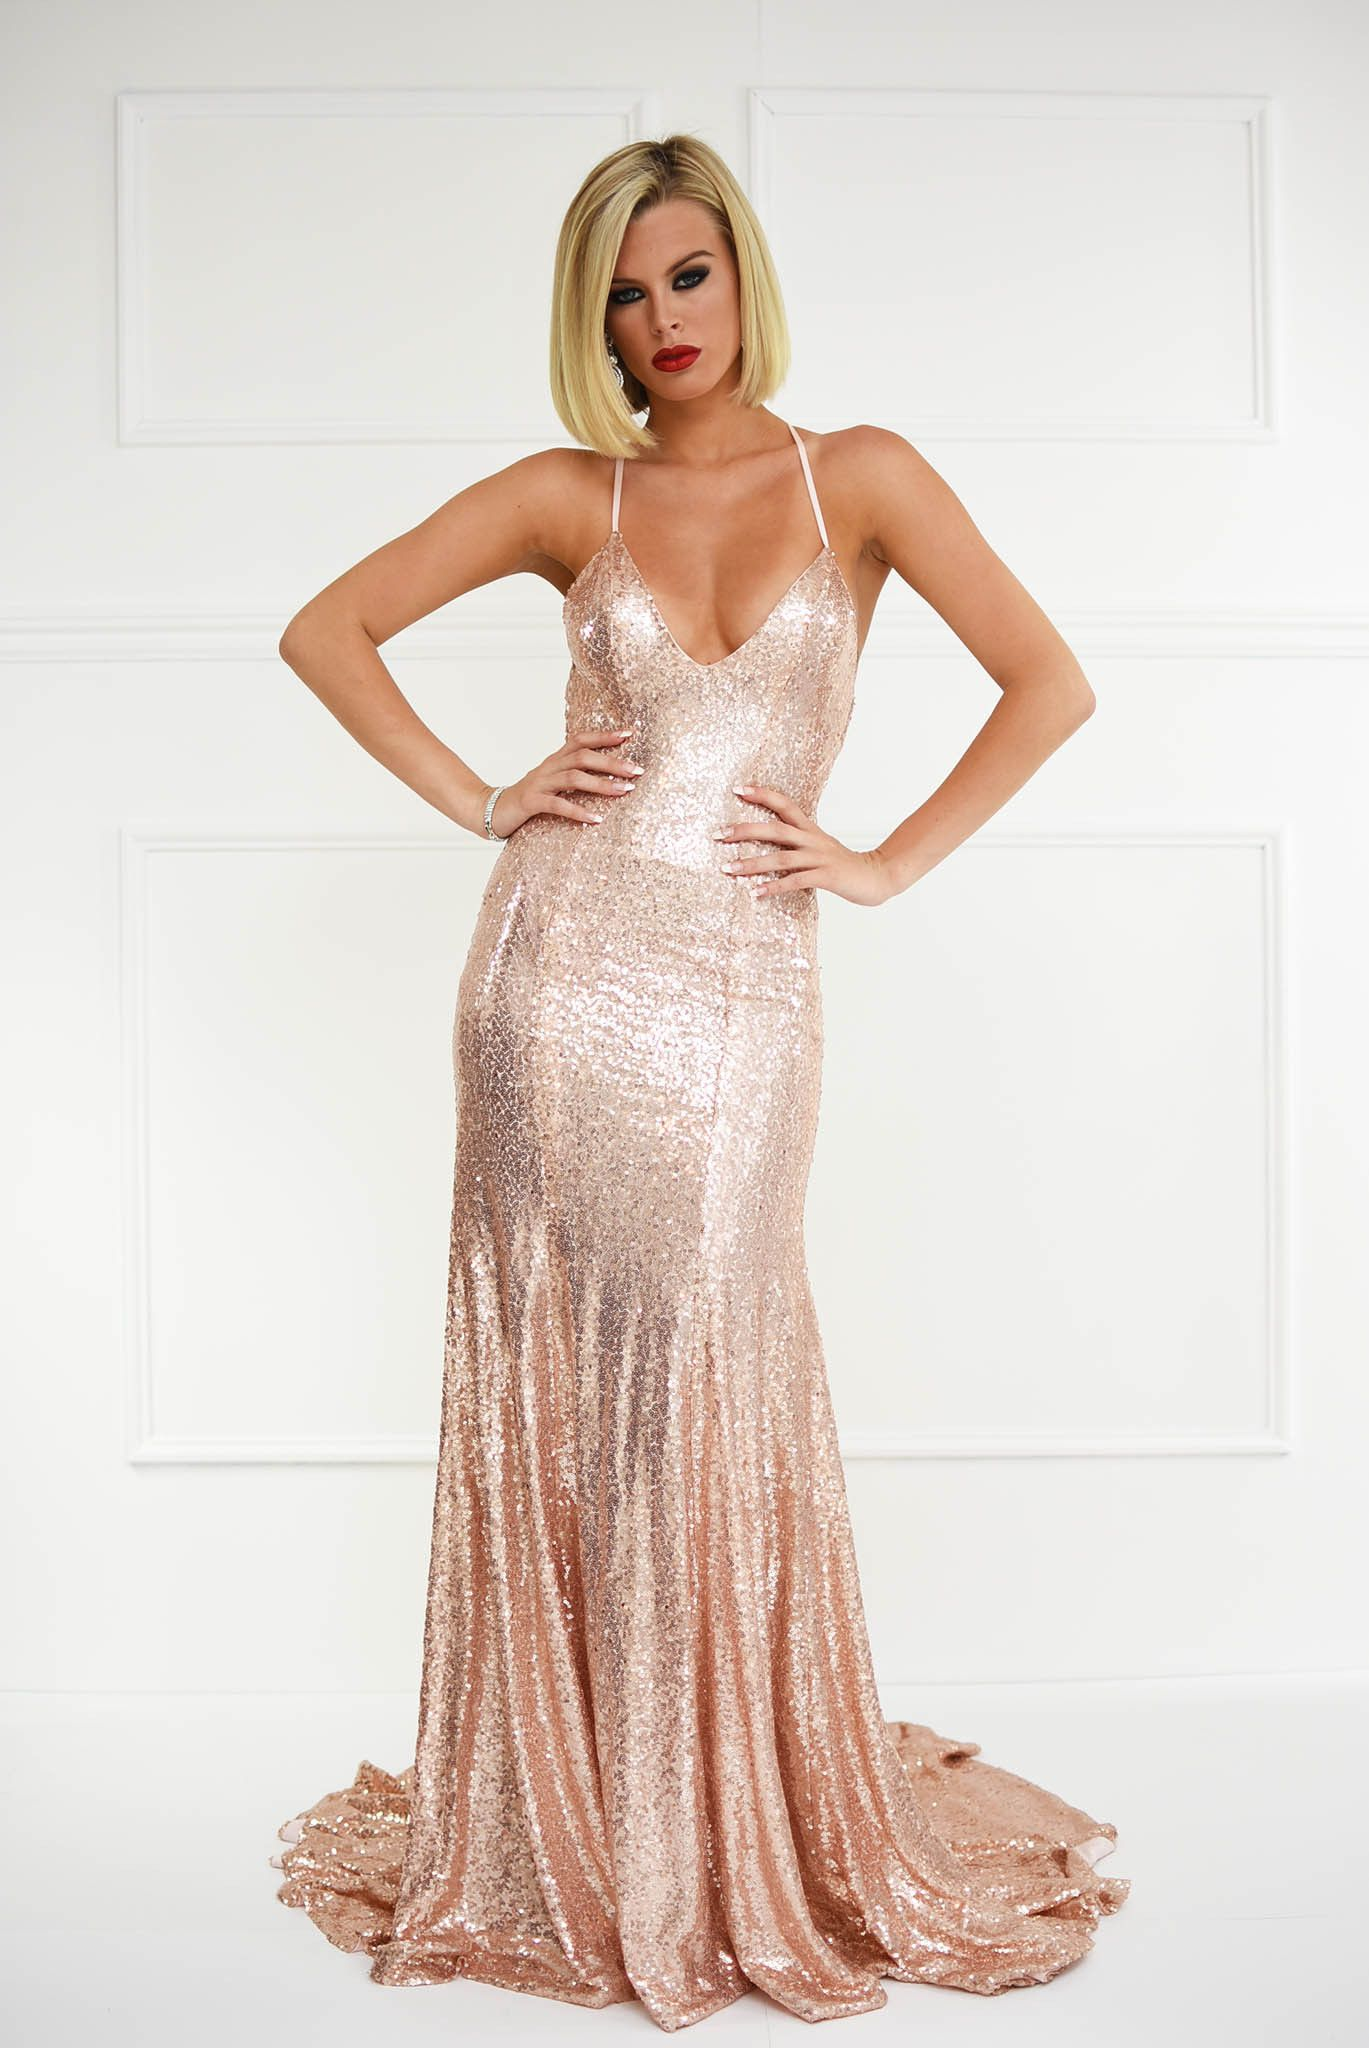 Estelle Gown - Rose Gold | Dress ideas | Pinterest | Gowns, Formal ...